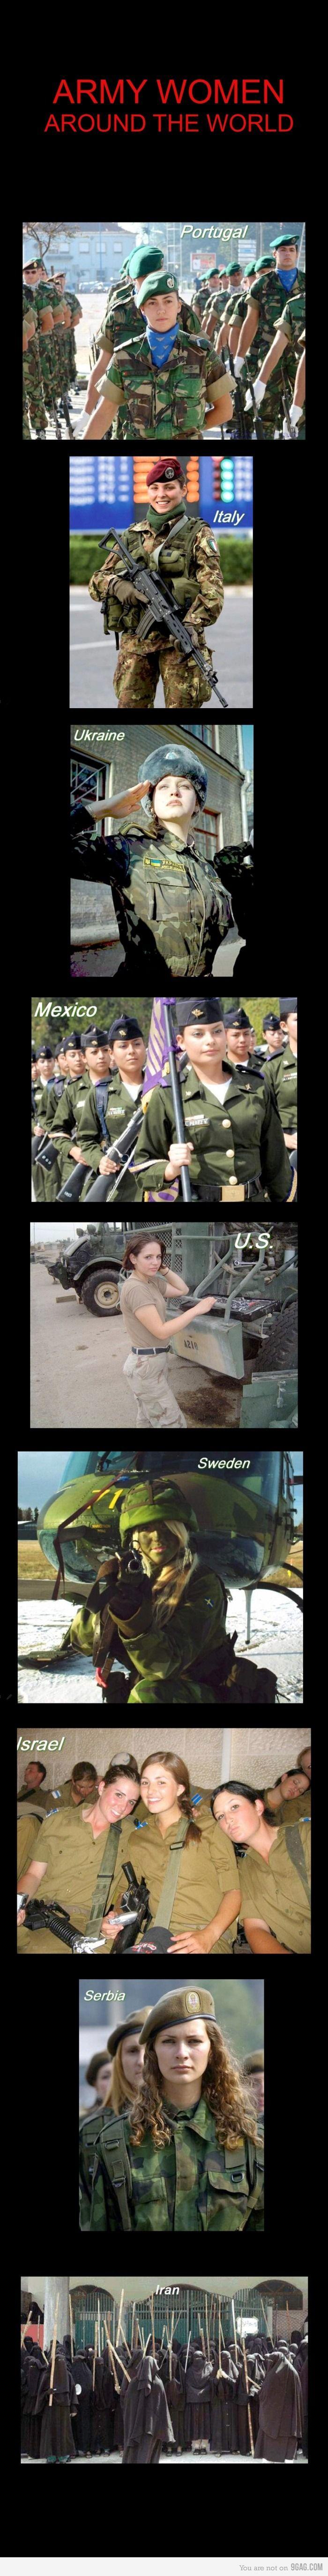 Army Women...Like a BOSS.